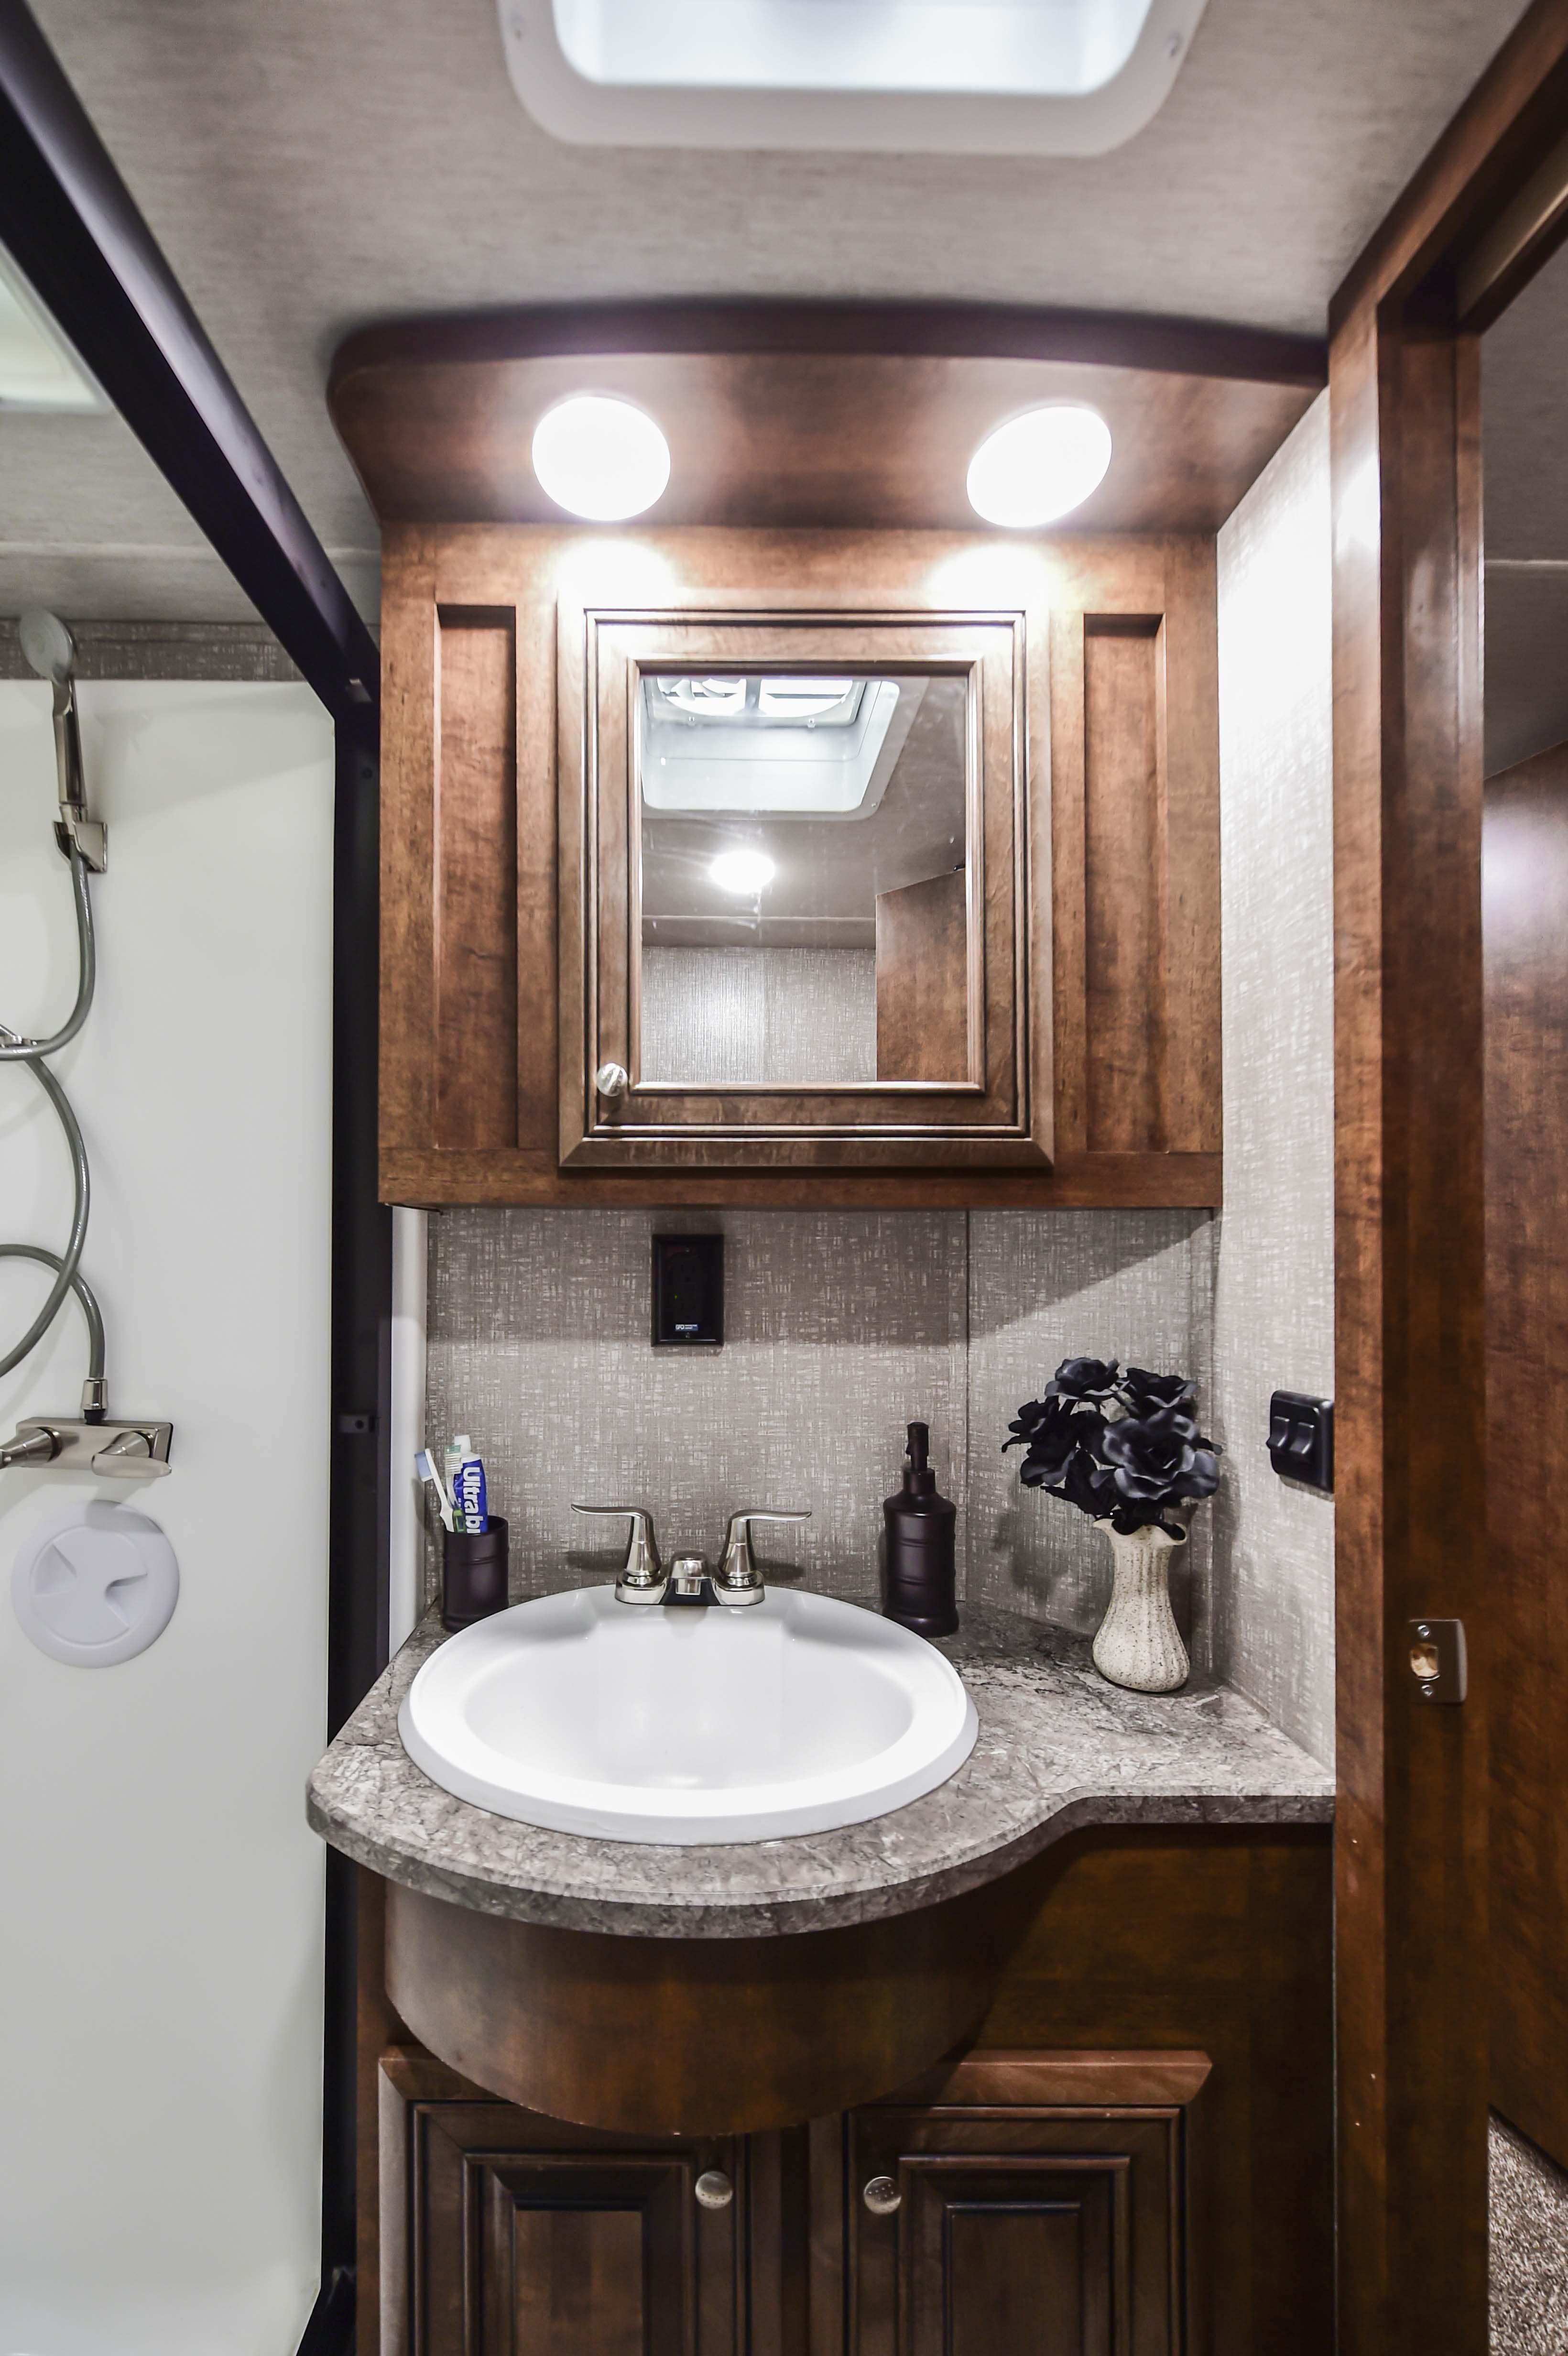 2018 Bighorn Traveler 39mb 5th Wheel Rv Bathroom Vanity Heartlandrvs Bighorn Fifthwheel Rv Bathro Bathroom Vanity Bathroom Vanity Lighting Bathroom Design [ 4928 x 3280 Pixel ]